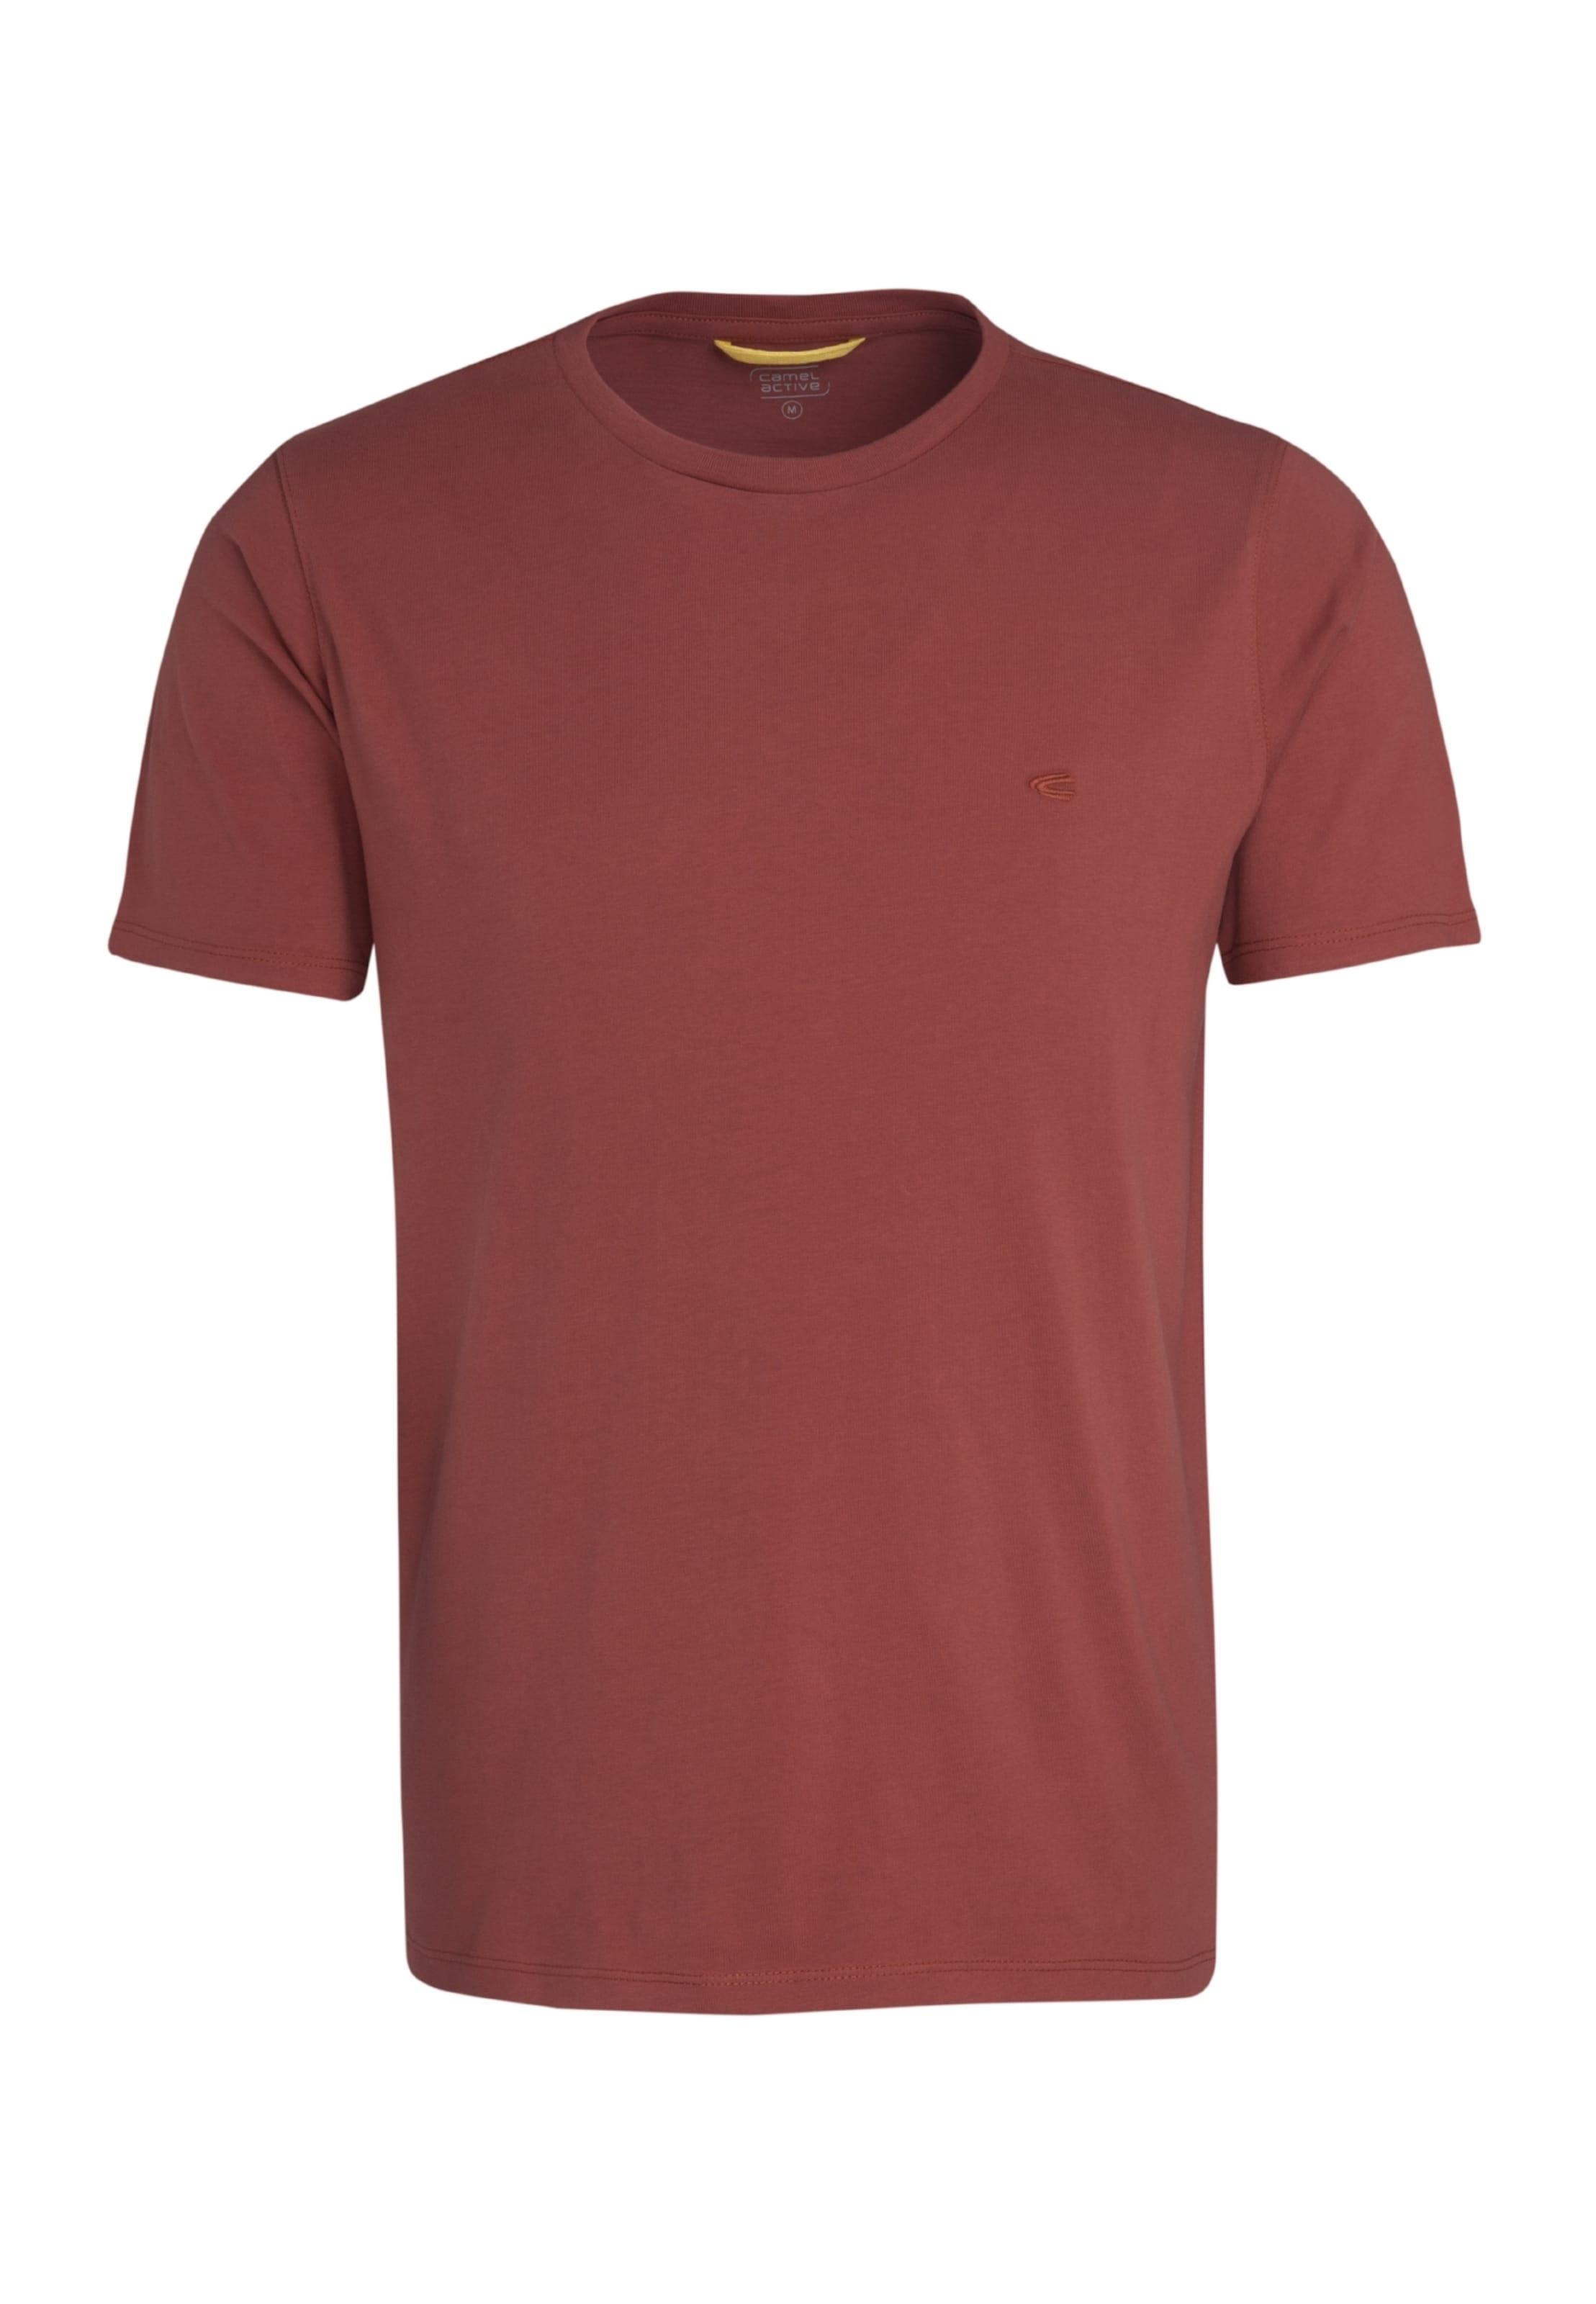 Camel T Rubinrot Active shirt In vYymb7I6fg